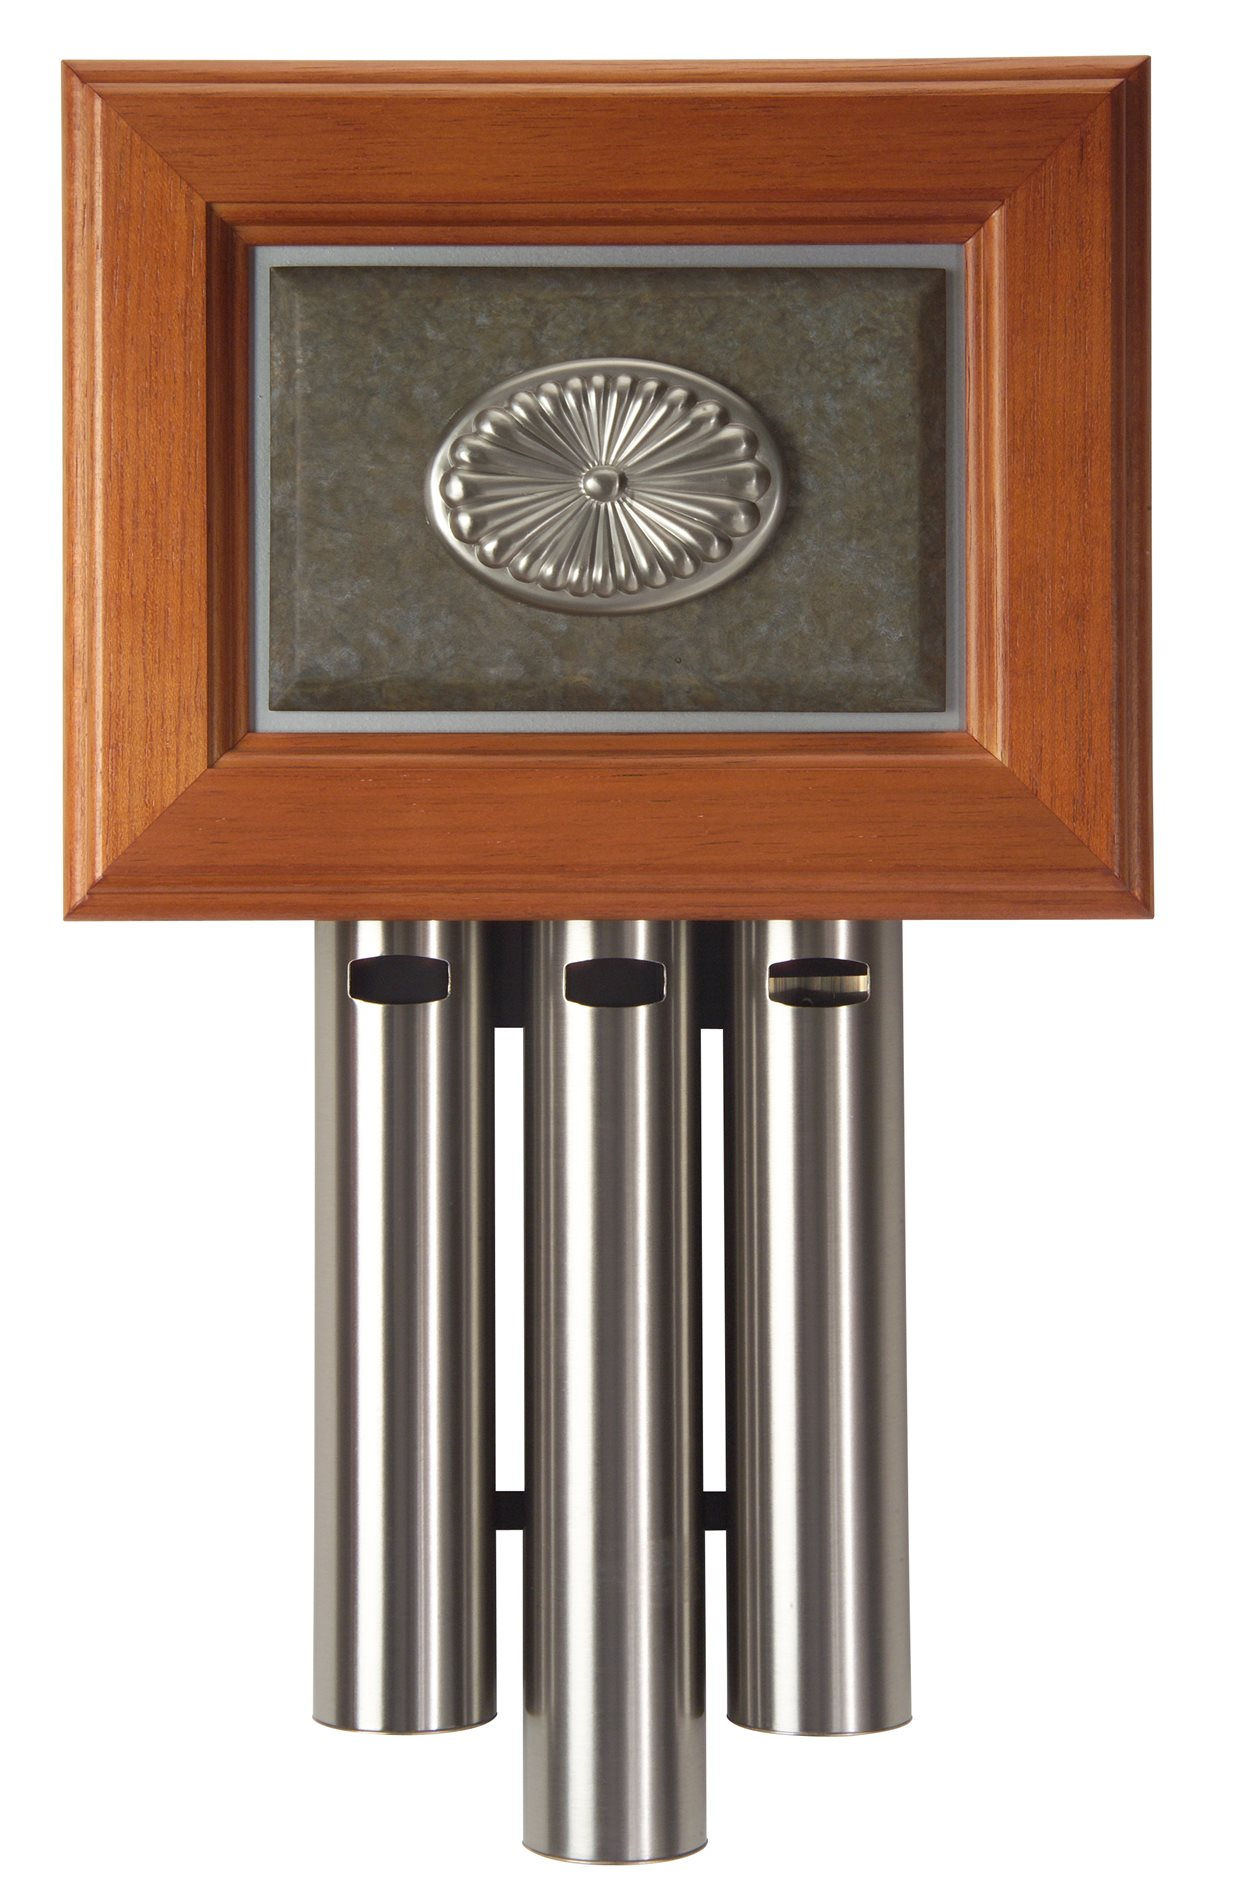 Teiber C3 Pw Designer Tube Short Door Chime Cm Nutone Musical Wiring Diagram Zoom